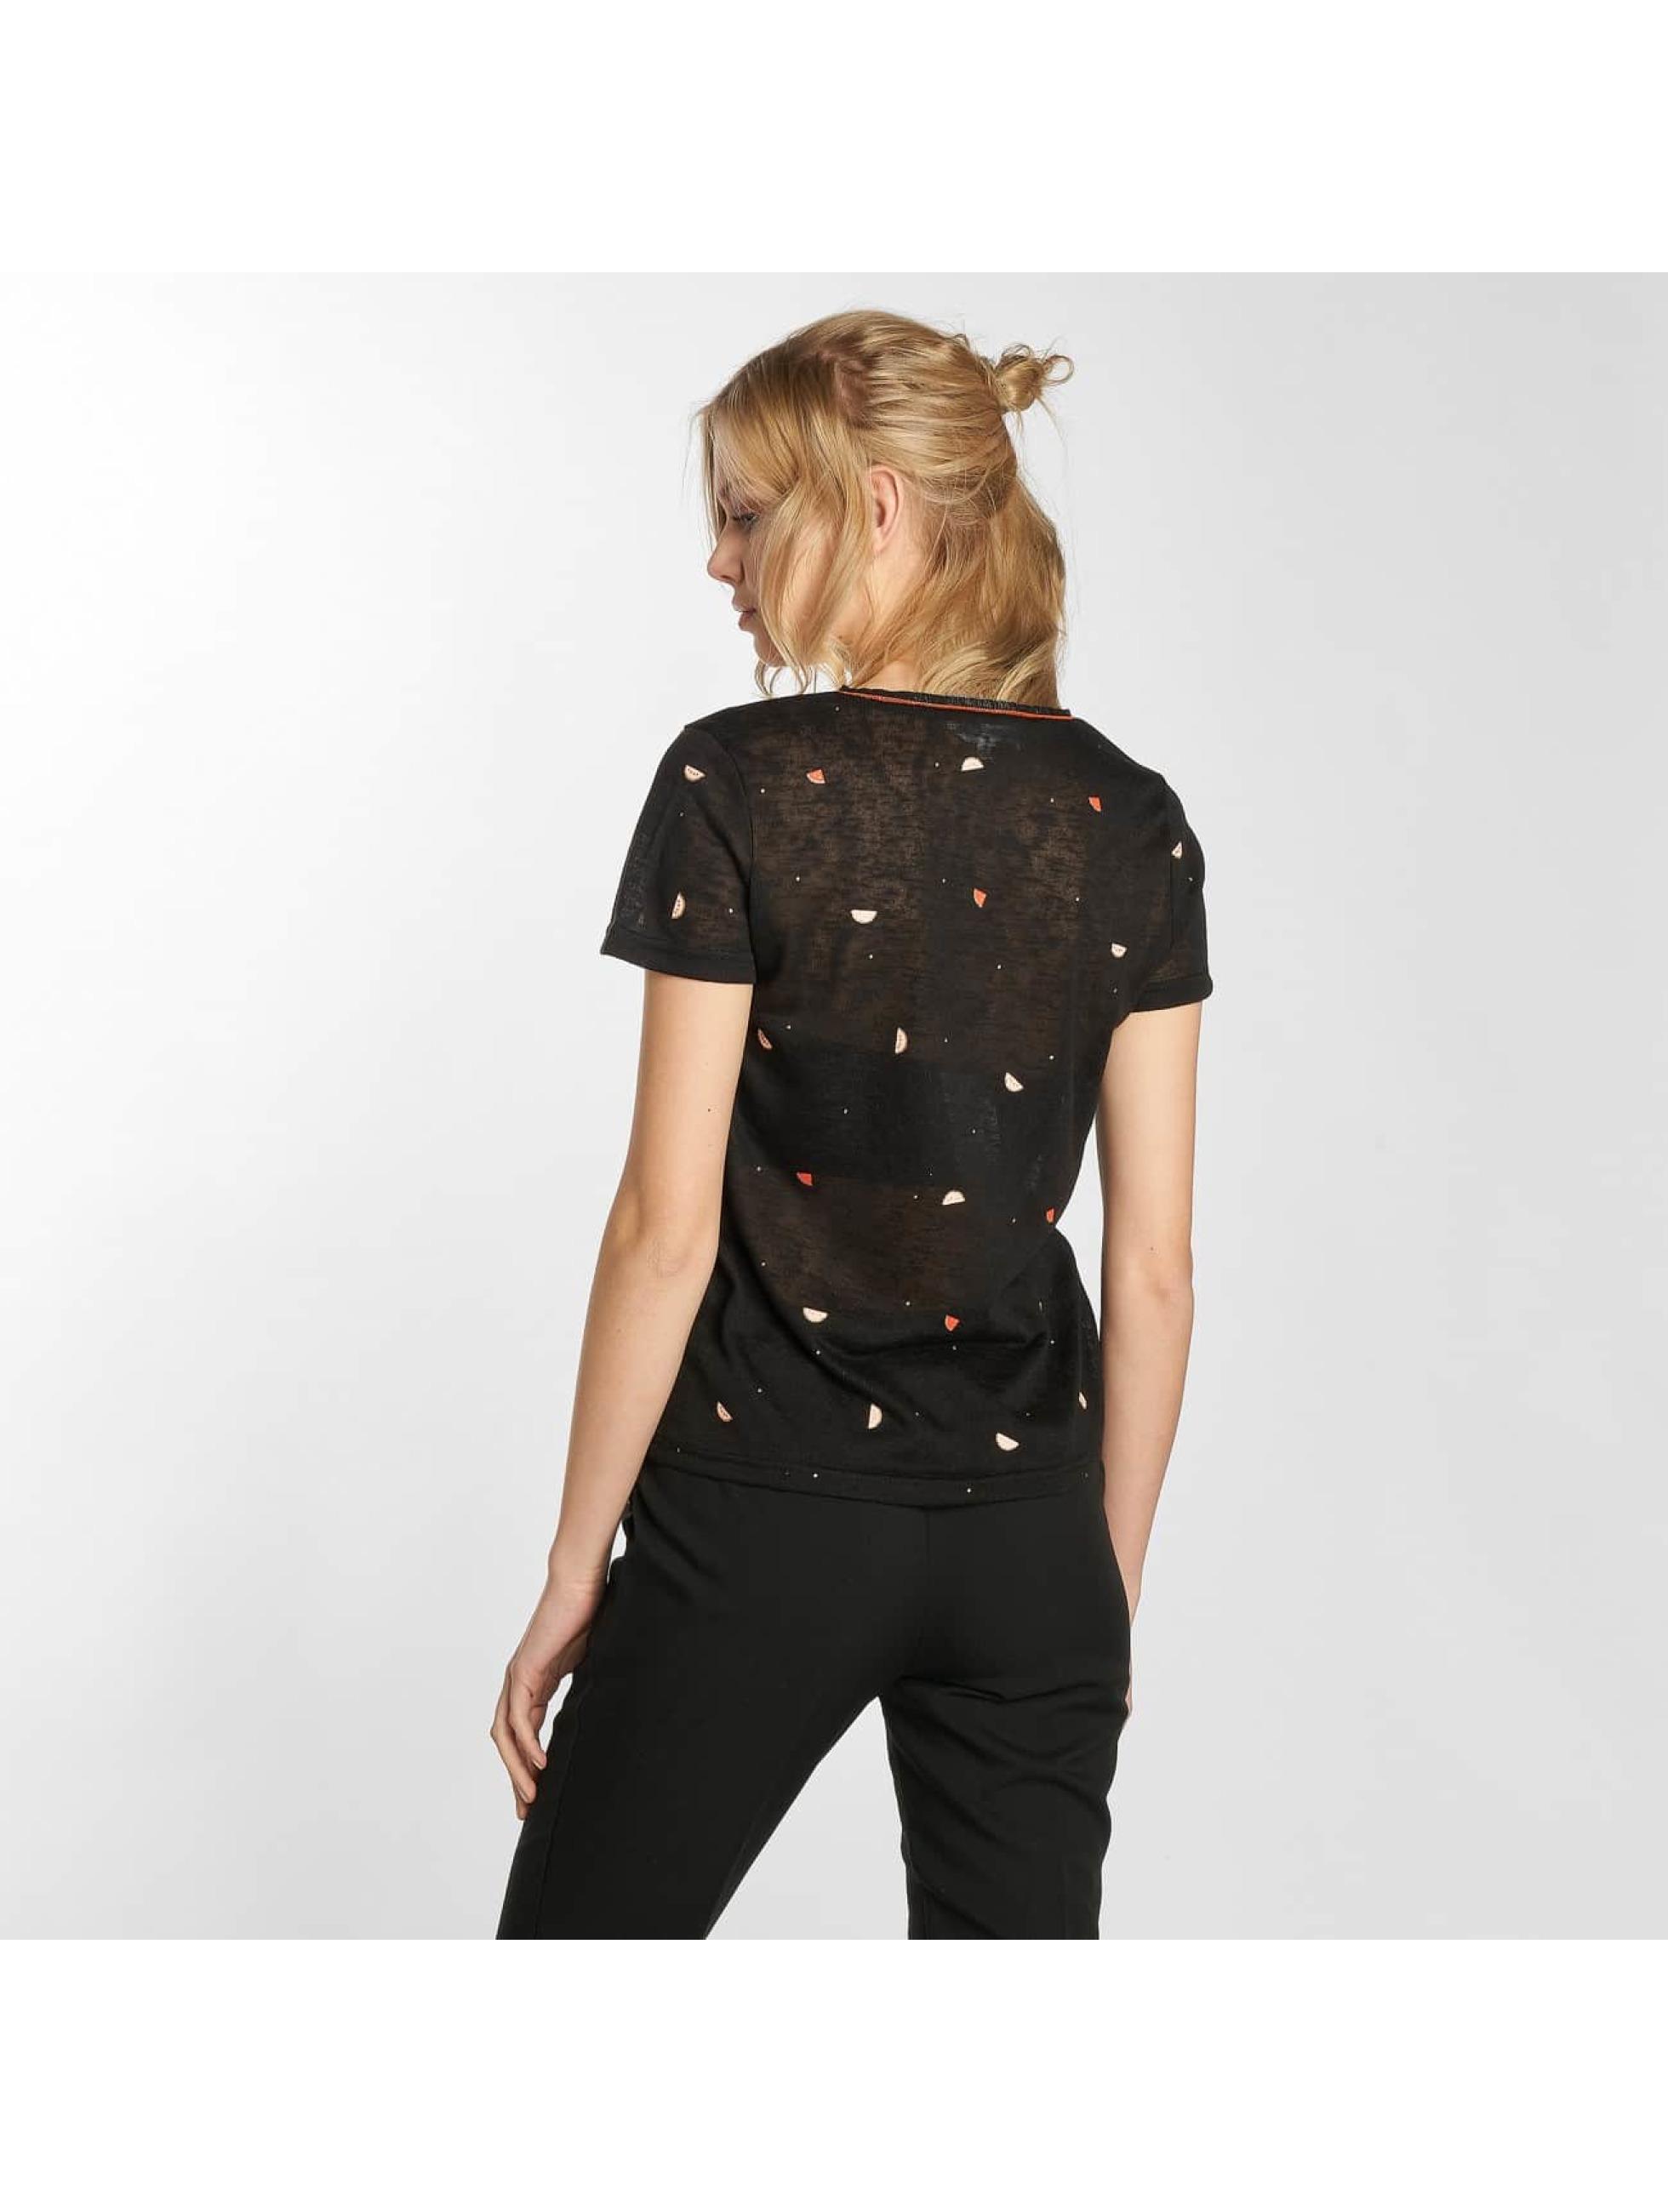 Grace & Mila T-Shirt Paquita schwarz